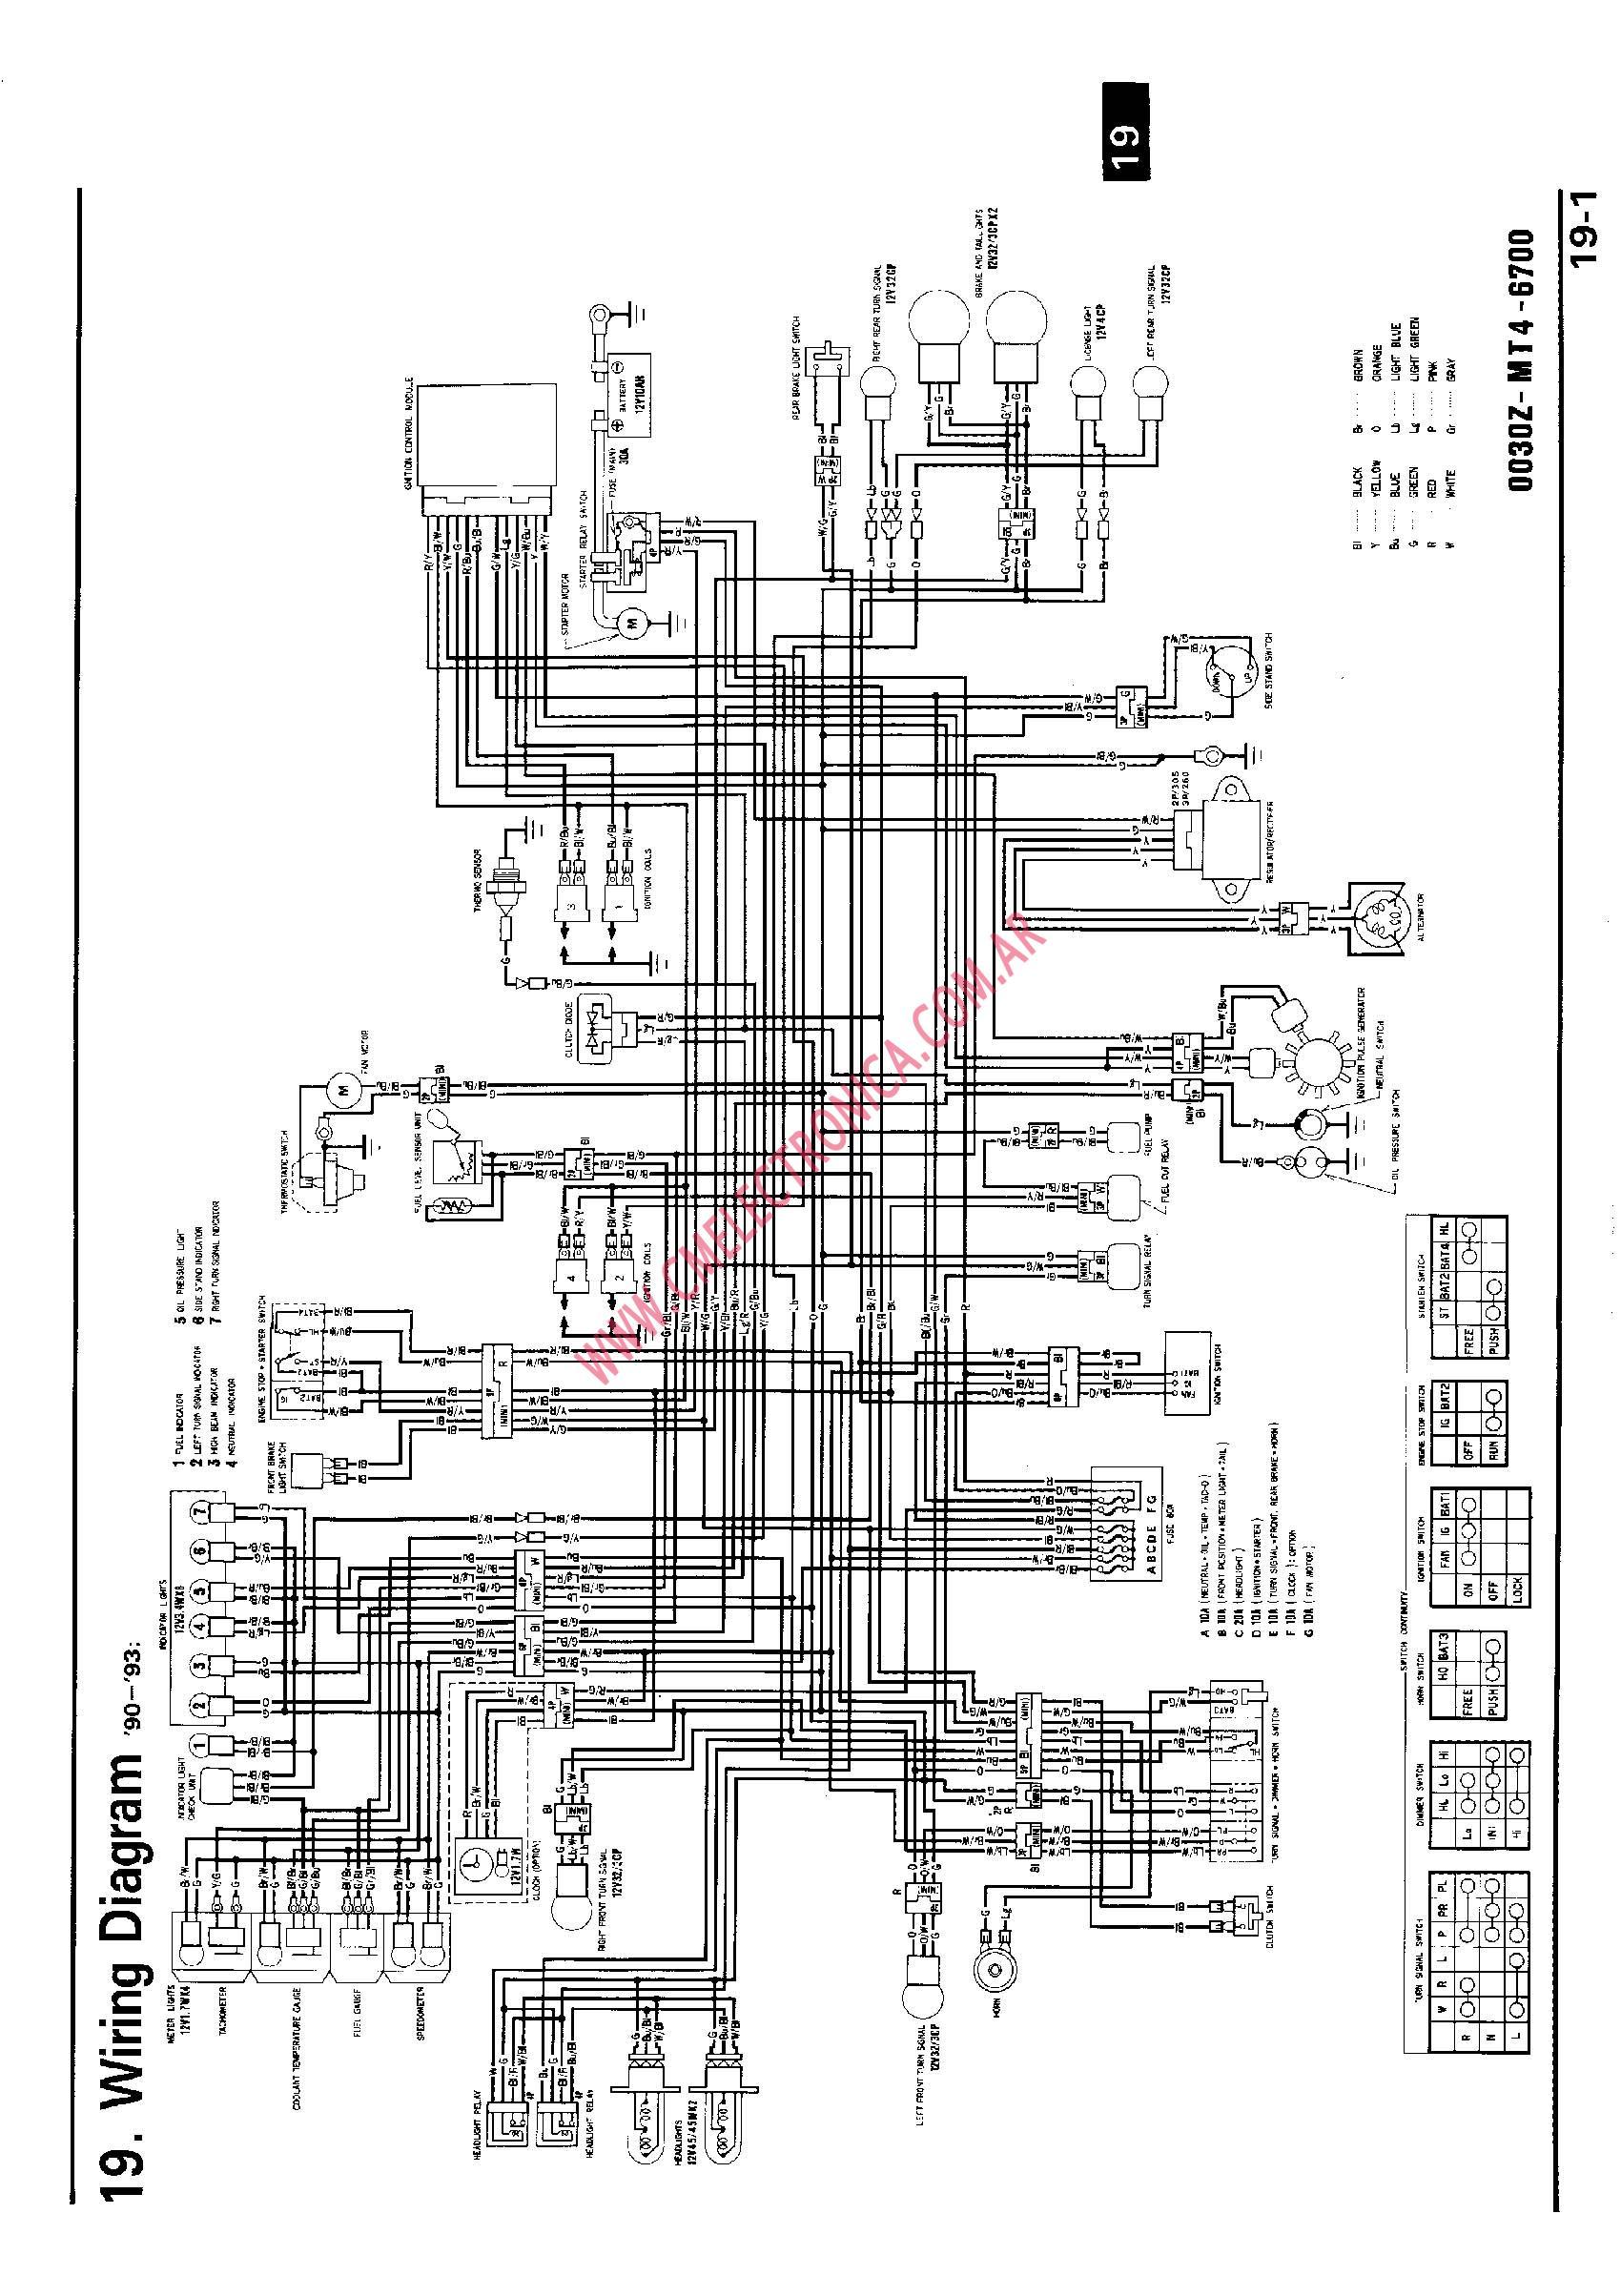 vfr 750 wiring diagram